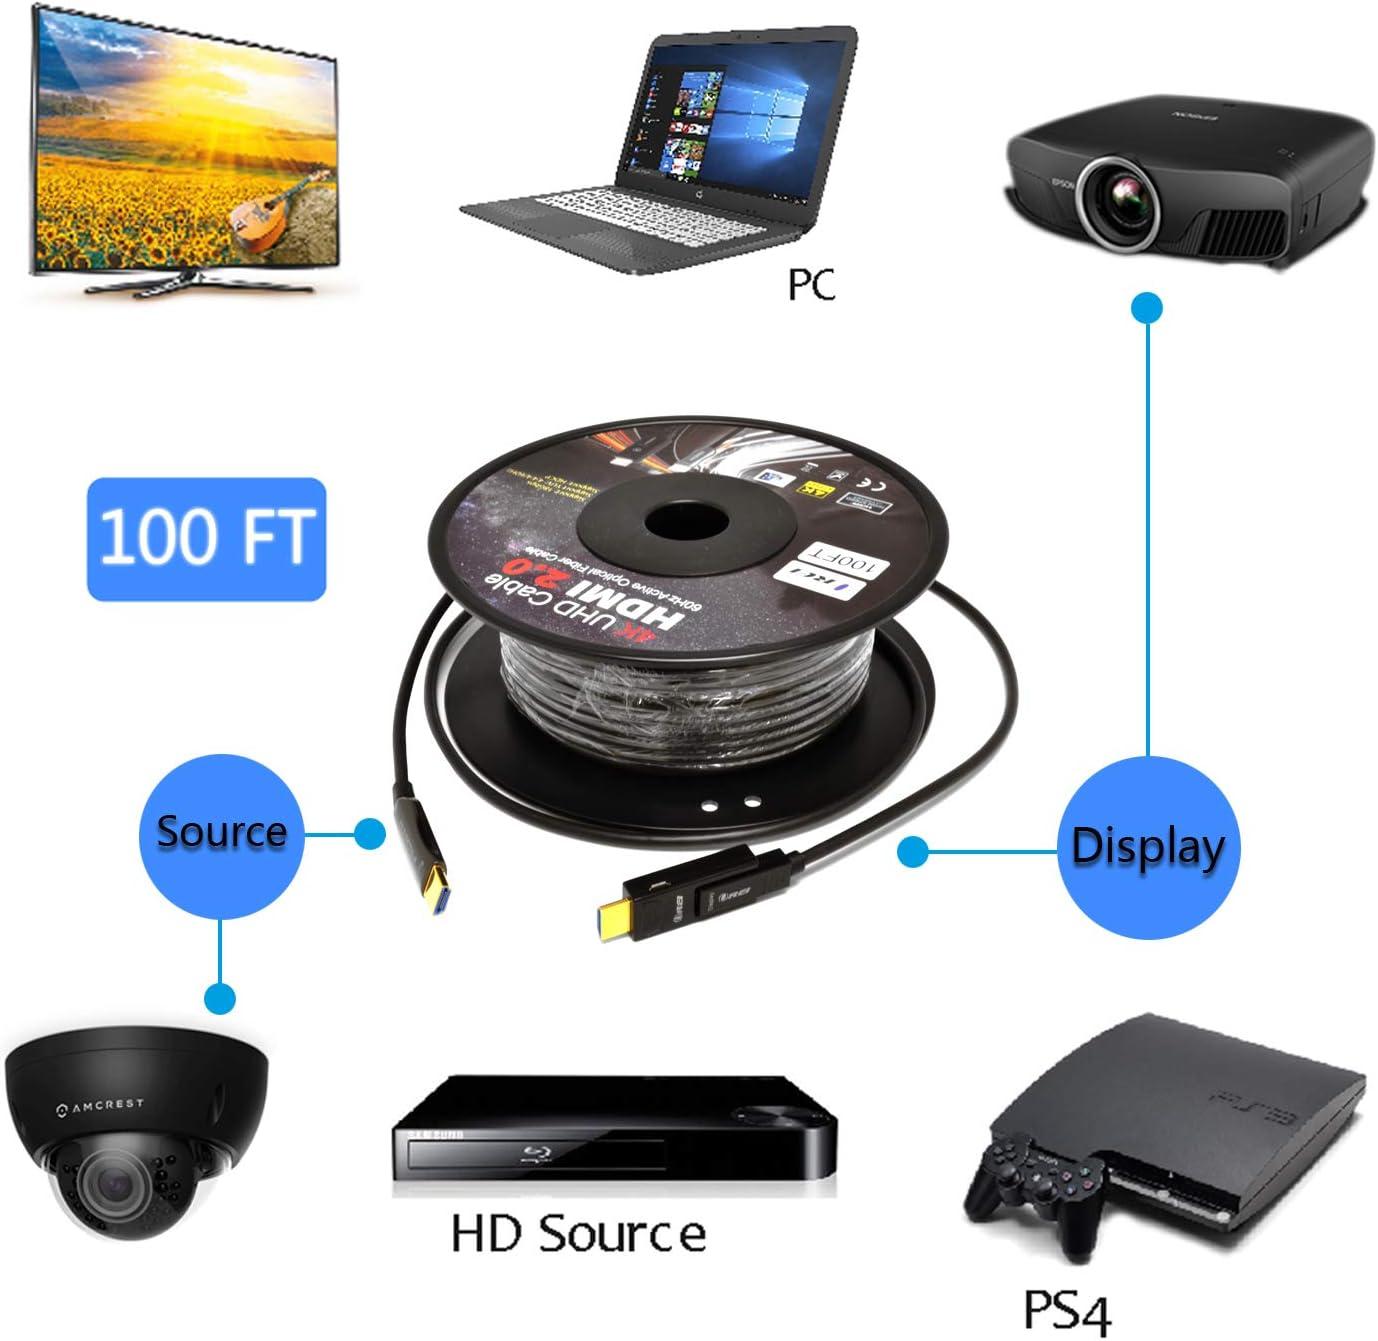 High Speed 18Gbps Subsampling 4: 2: 0 Slim and Flexible HDMI Fiber HDCP2.2 3D Arc Orei Fiber Optic Active HDMI Cable 4K 150ft @ 60Hz Fiber Optic HDMI Cable 2.0B HDR